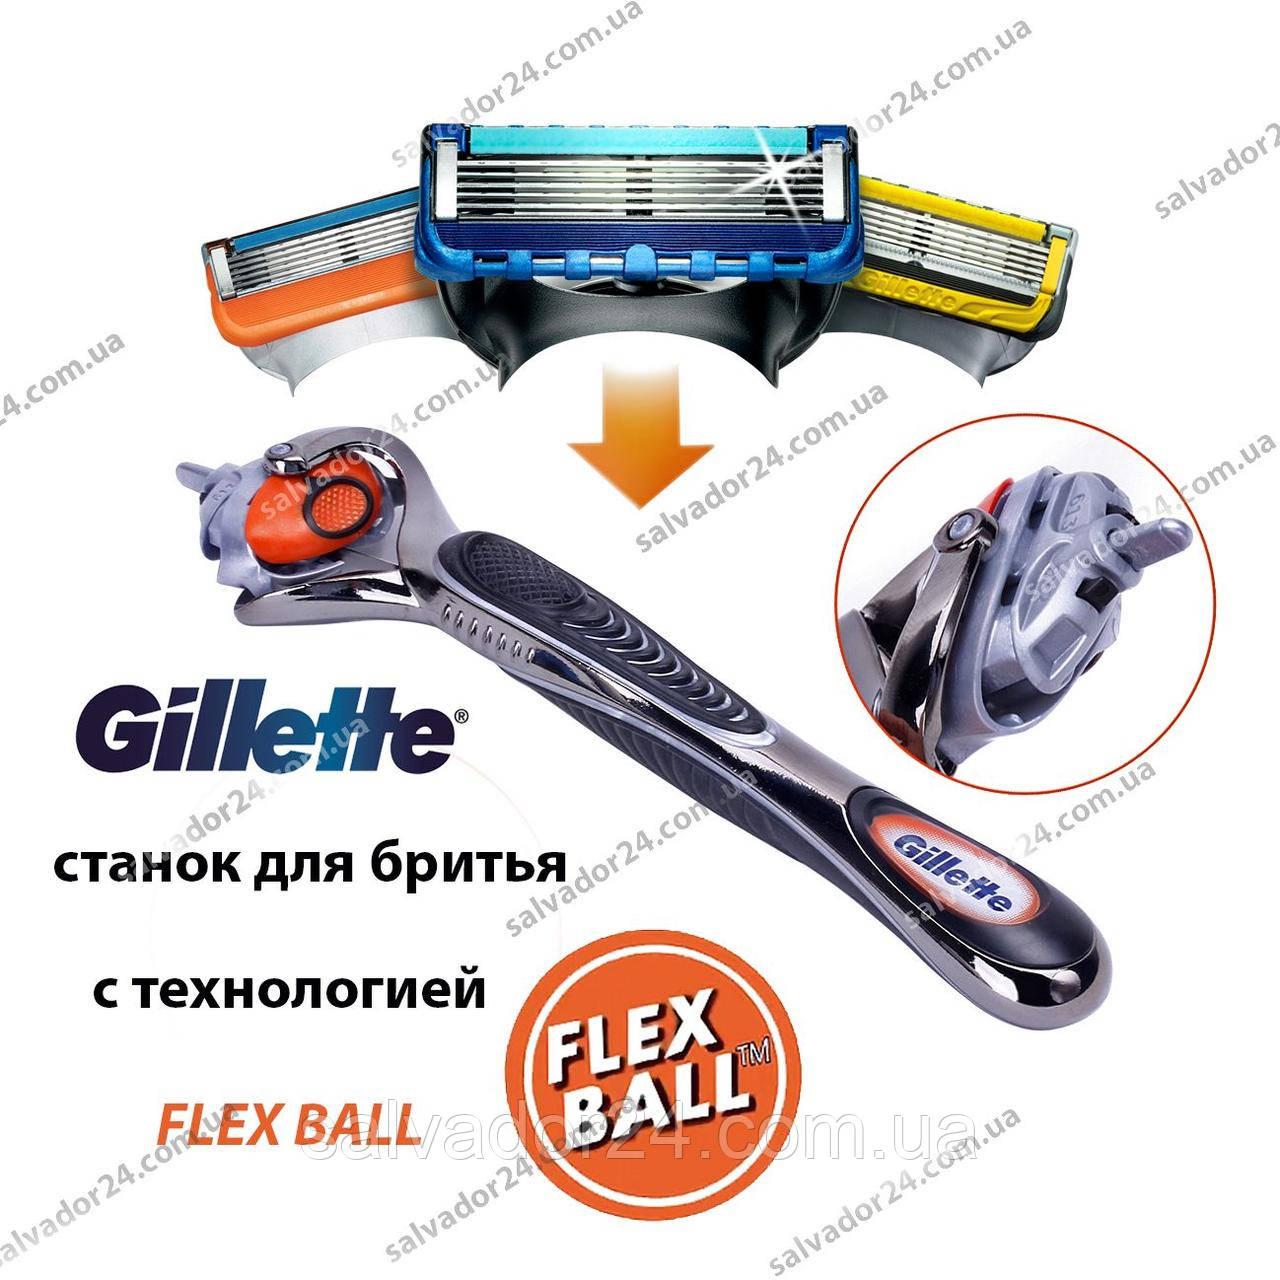 Бритвенный станок Gillette Fusion ProGlide with FlexBall Technology USA